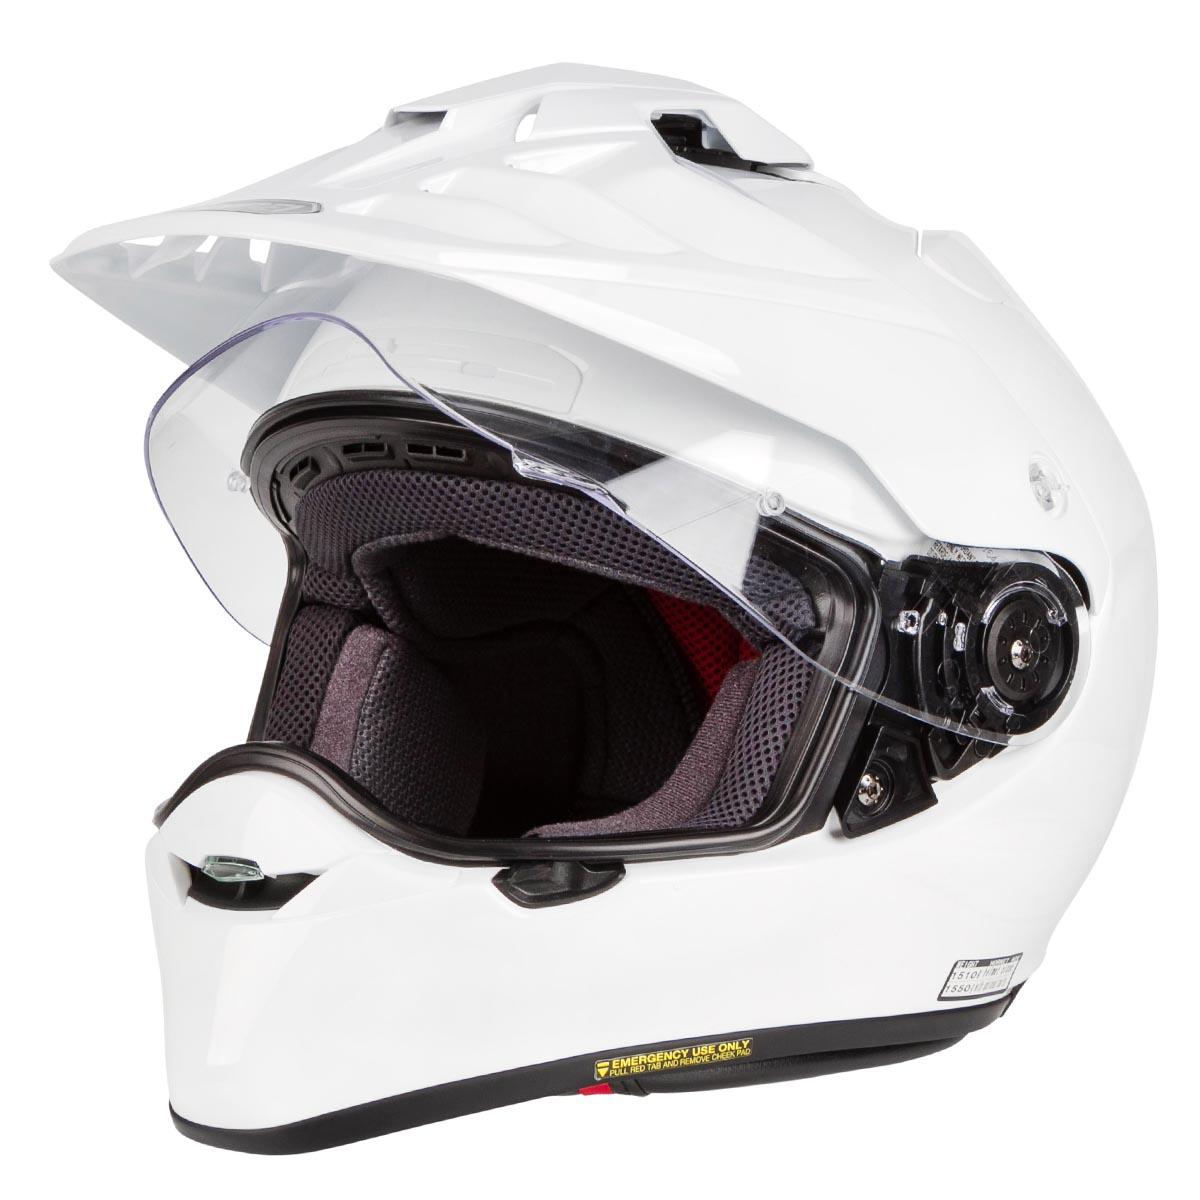 shoei helmet hornet adv white 2018 maciag offroad. Black Bedroom Furniture Sets. Home Design Ideas